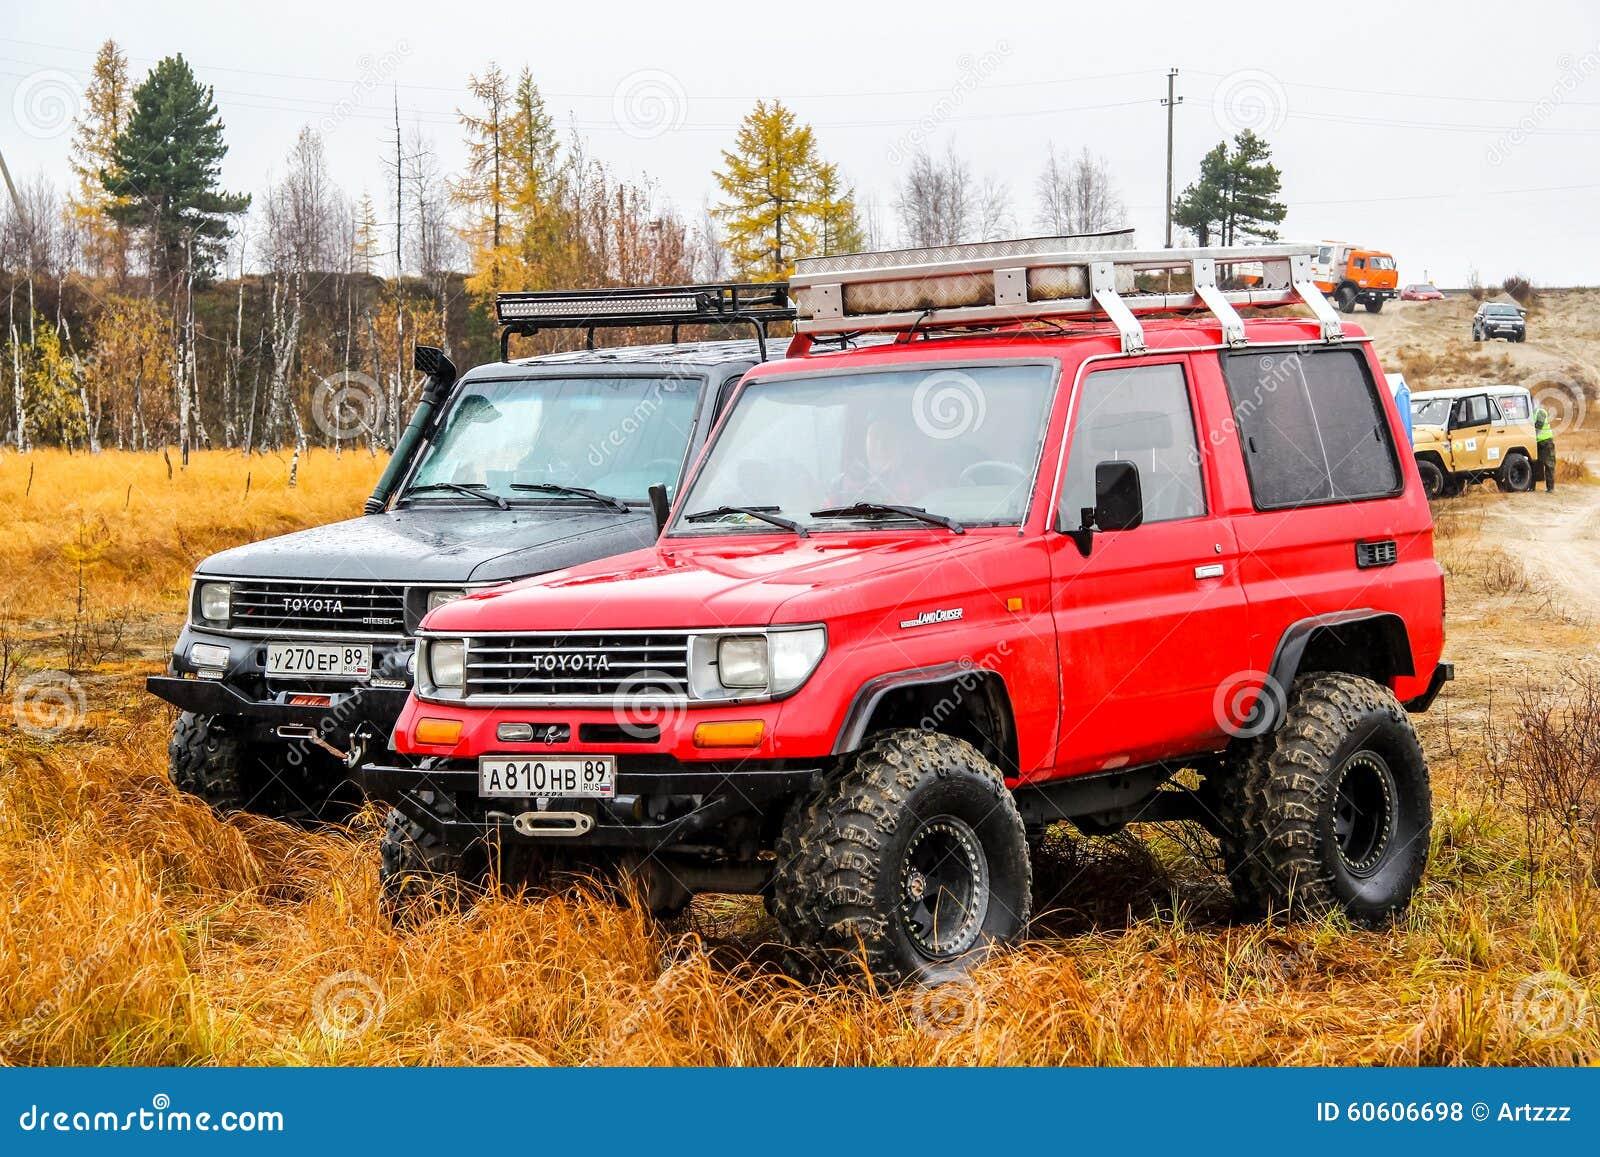 Toyota Land Cruiser Prado 70 Editorial Stock Photo Image Of Leaves 2015